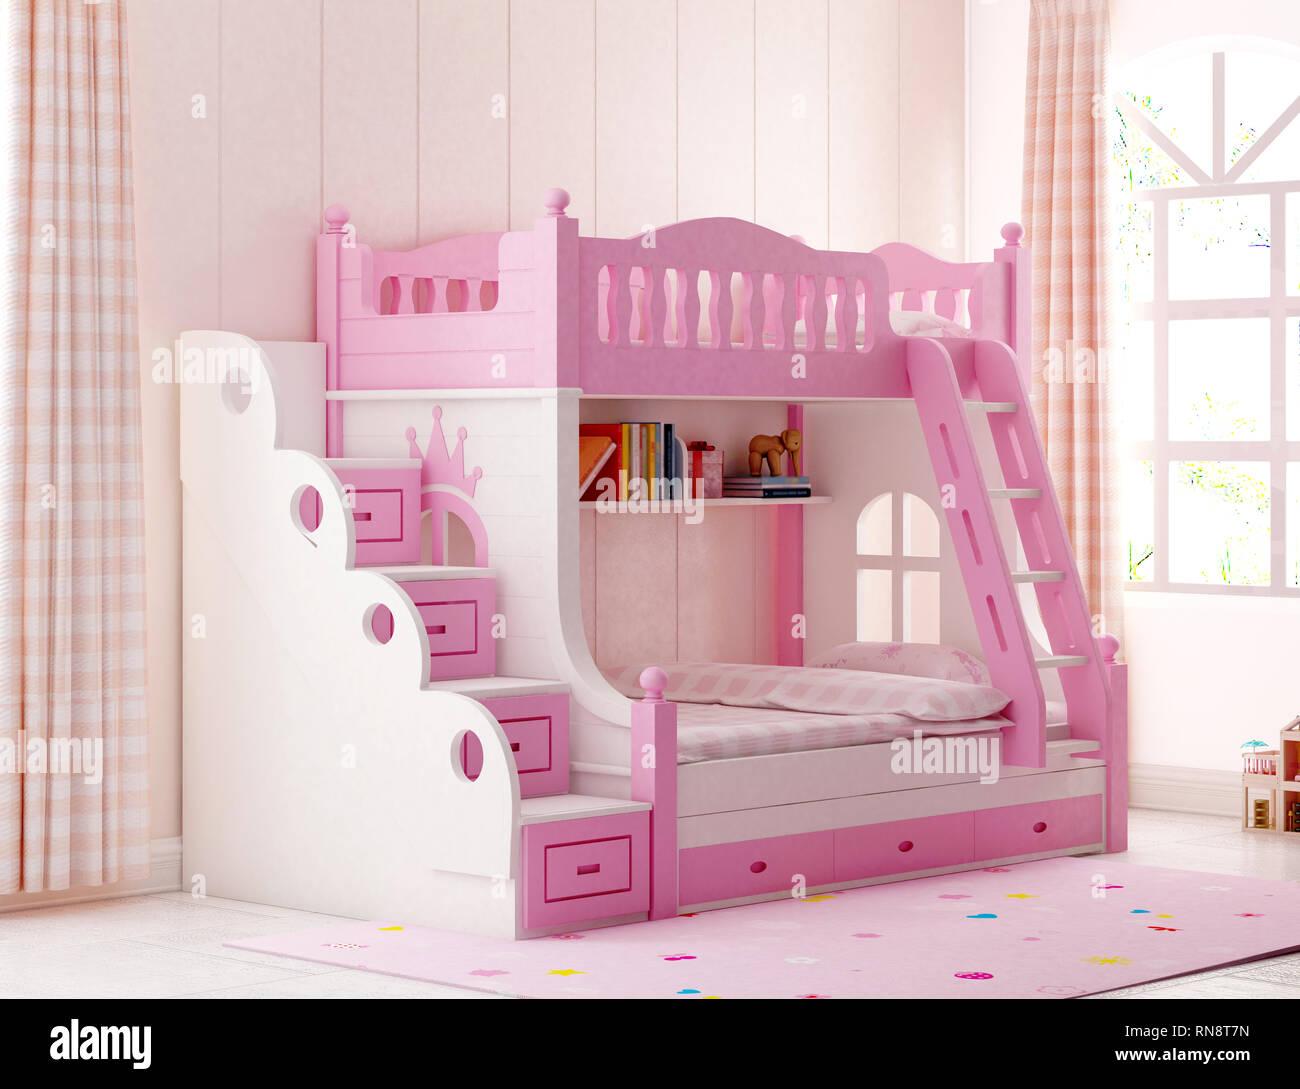 3d Render Pink Color Child Room Stock Photo - Alamy